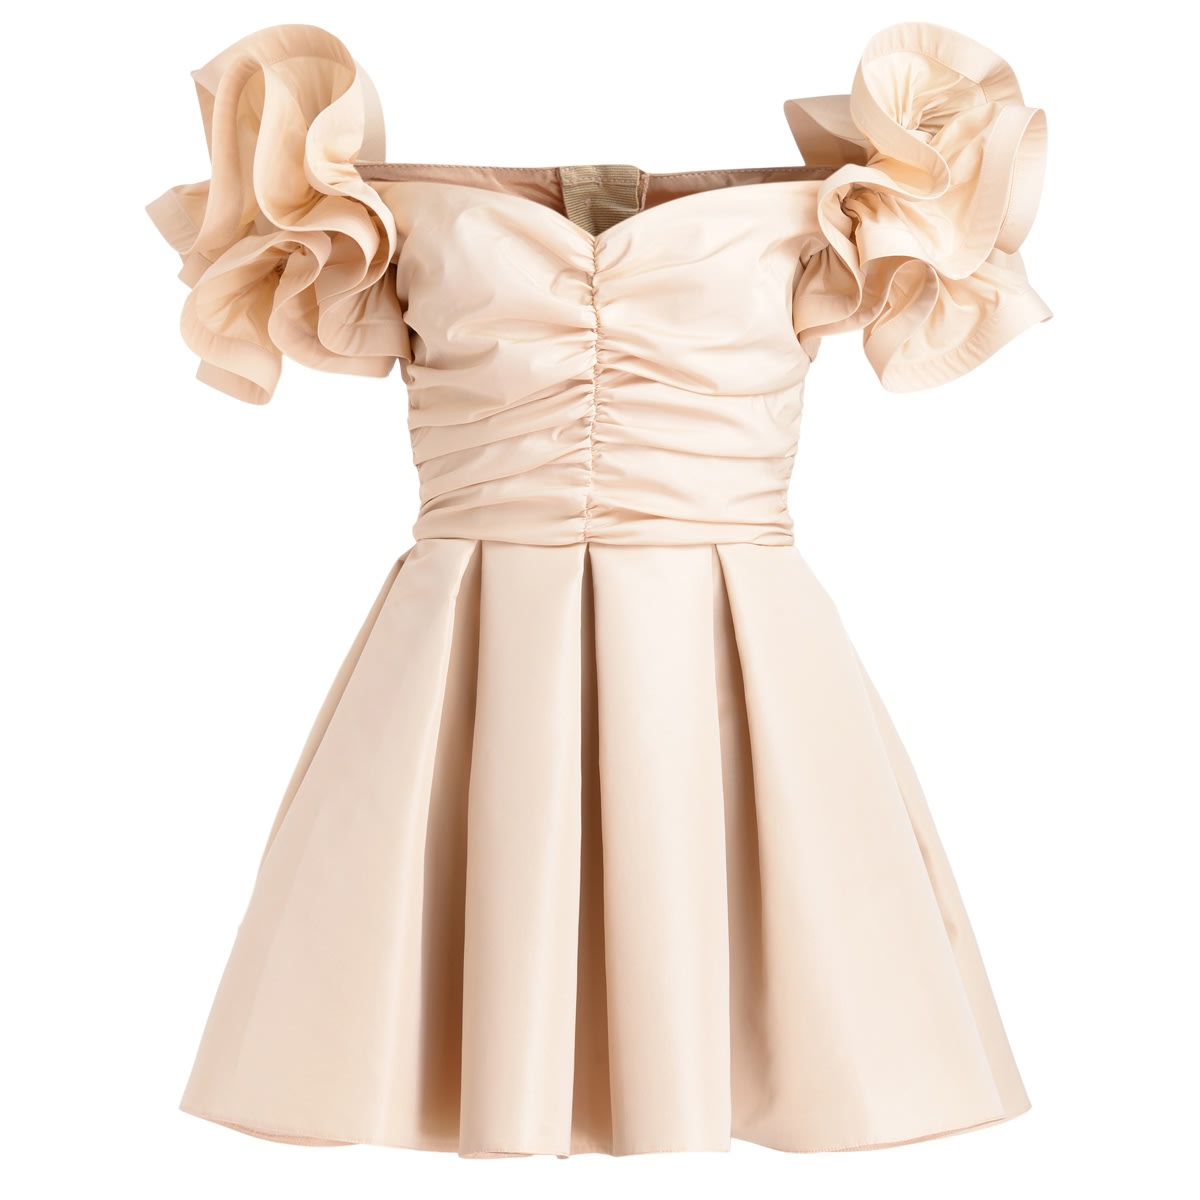 Buy Champagne Elisabetta Franchi Dress In Ottoman online, shop Elisabetta Franchi with free shipping